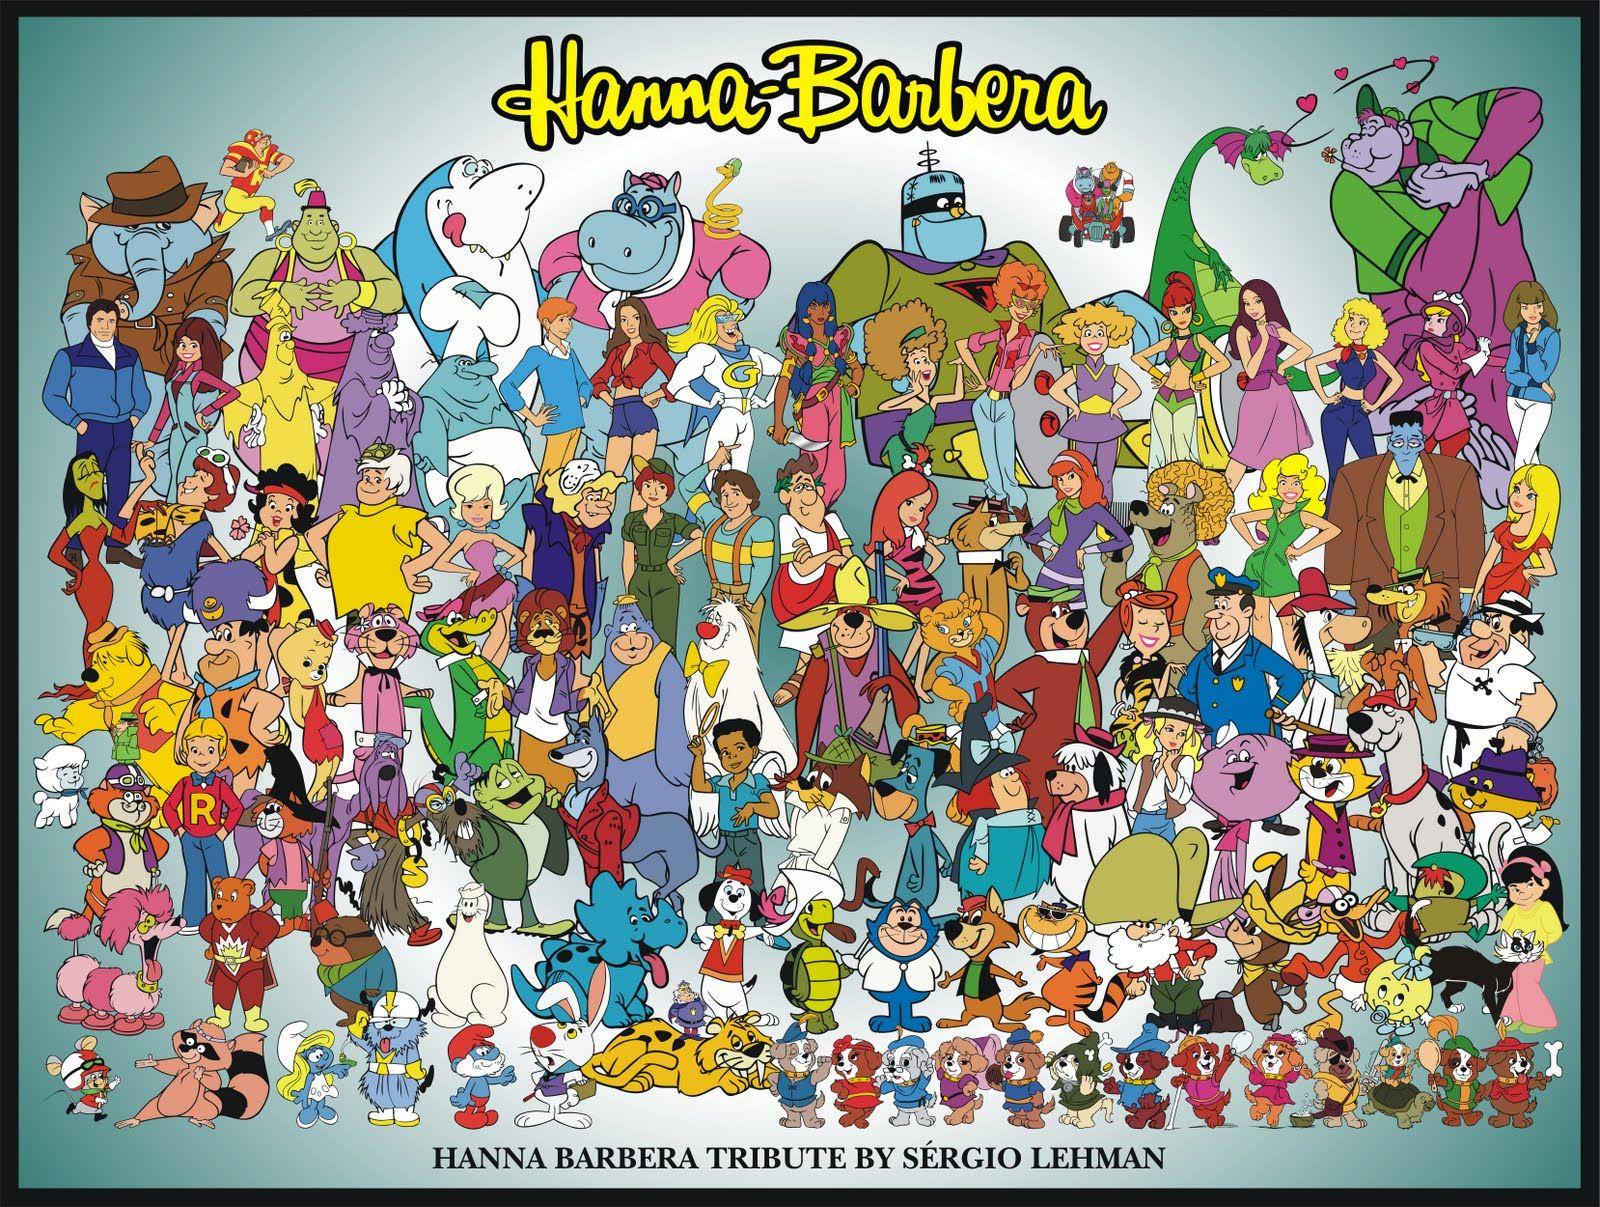 Homenaje a Hanna Barbera! | Desenhos animados vintage, Hanna ...